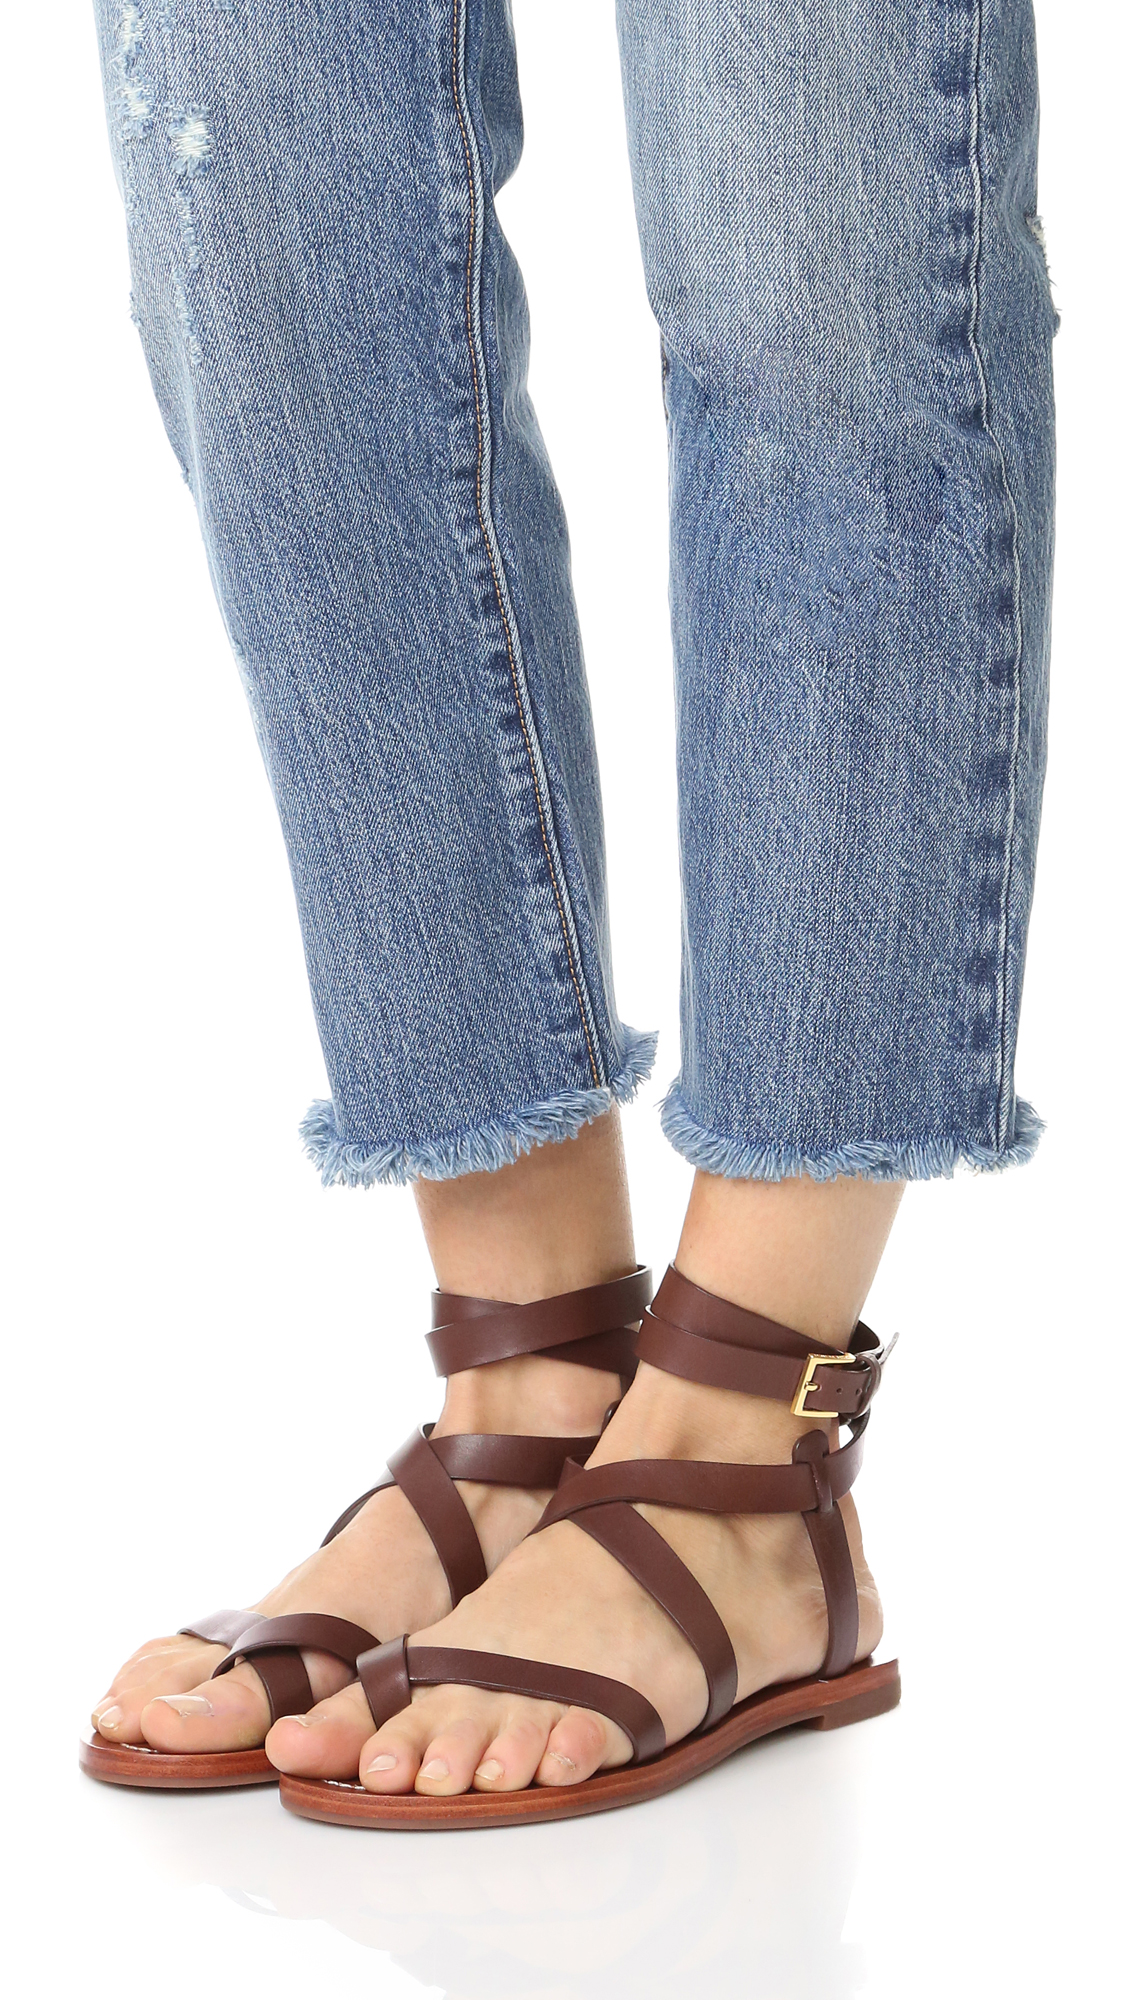 d9888125791d Tory Burch Patos Sandals